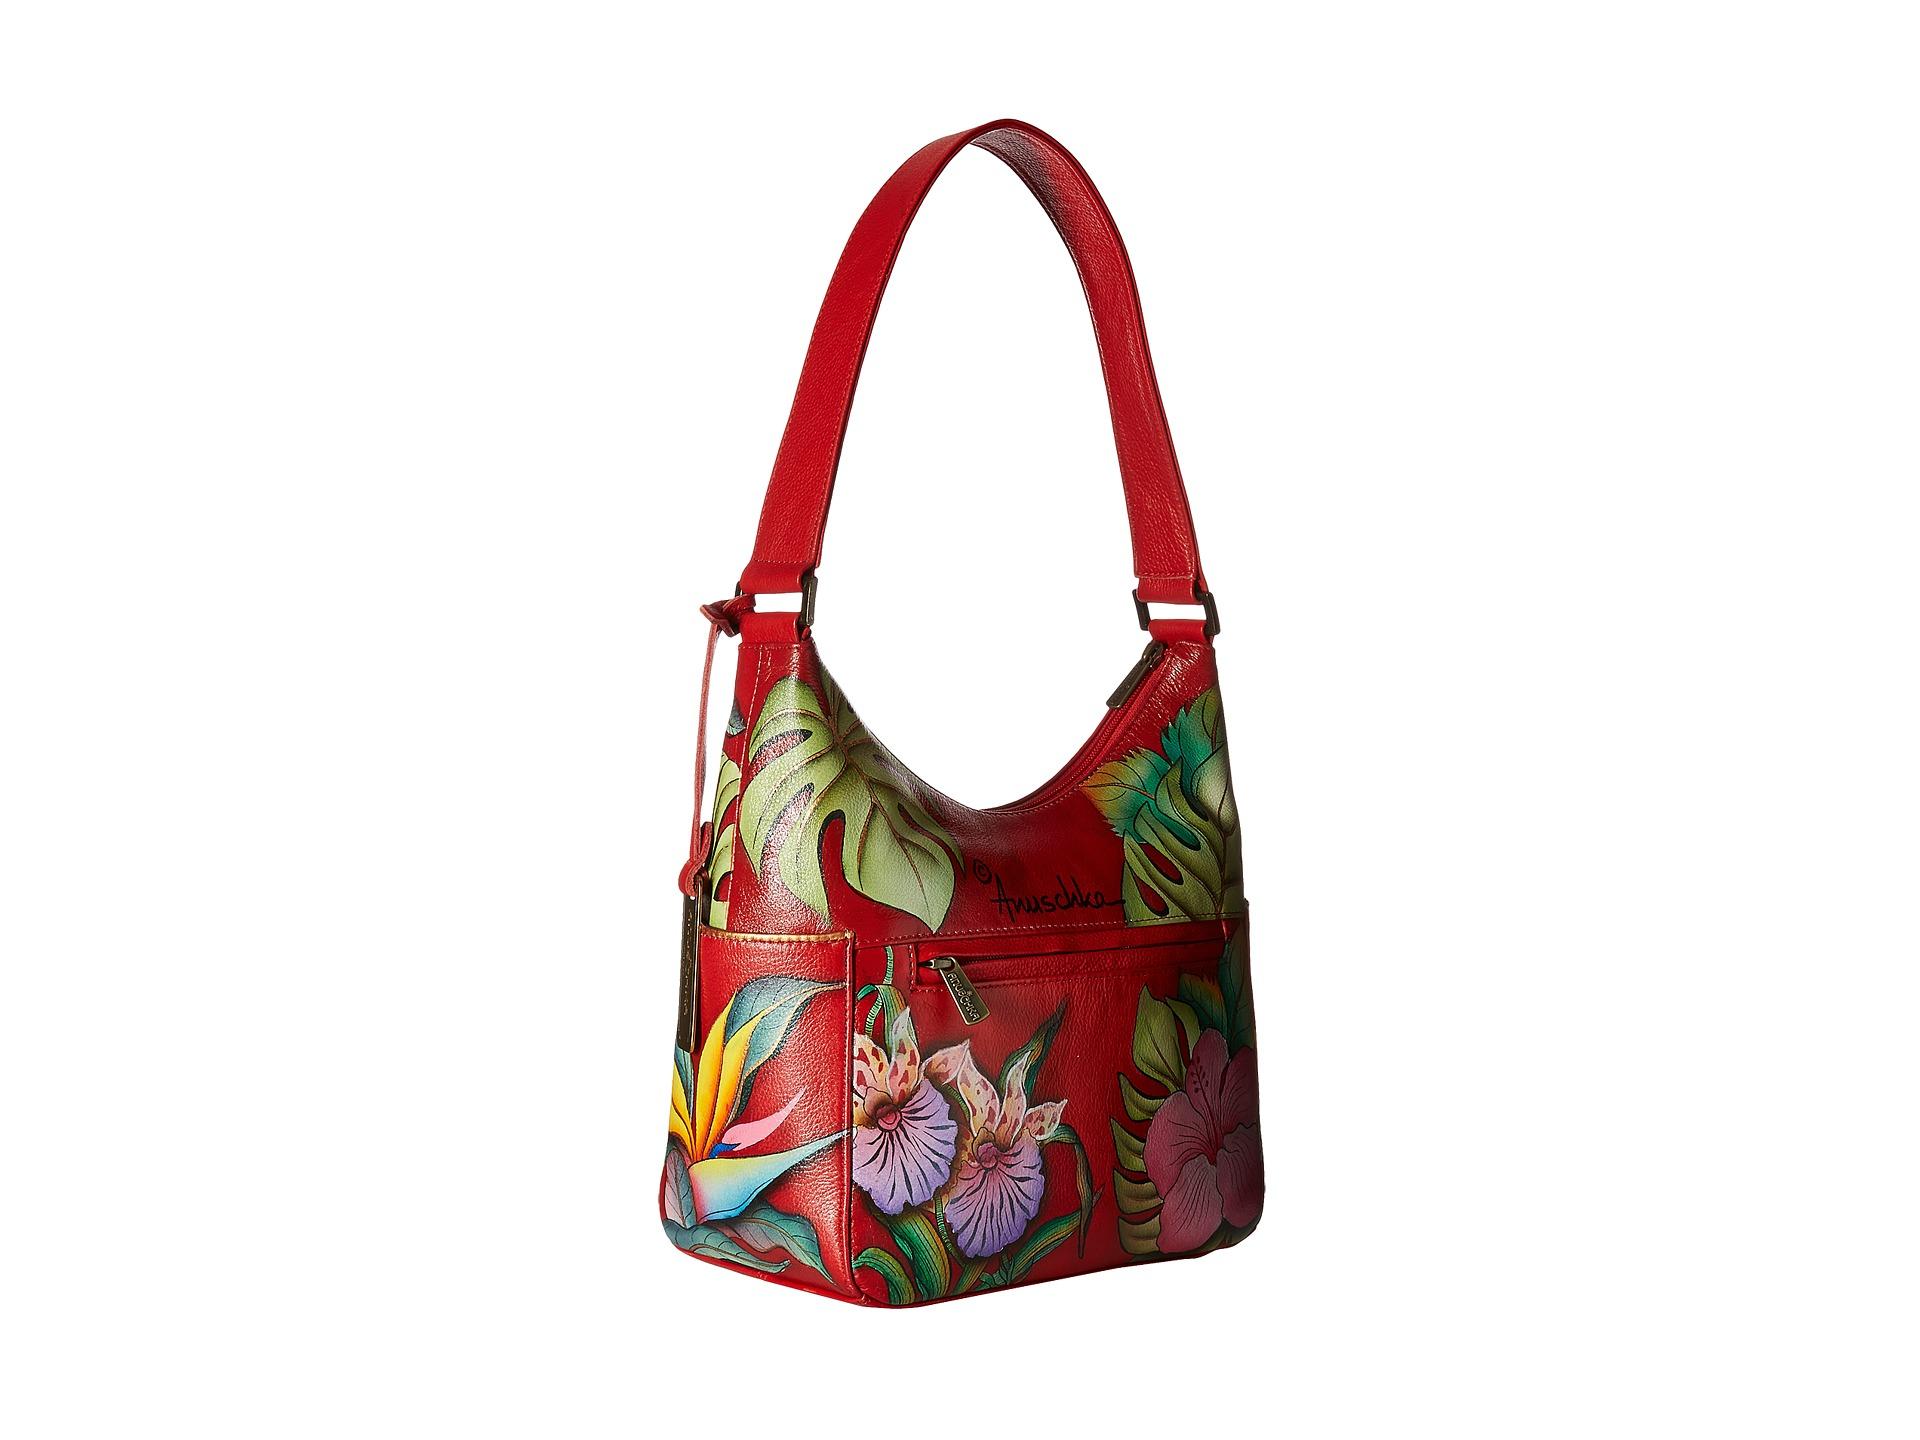 Chka Handbags Handbag Photos Eleventyone